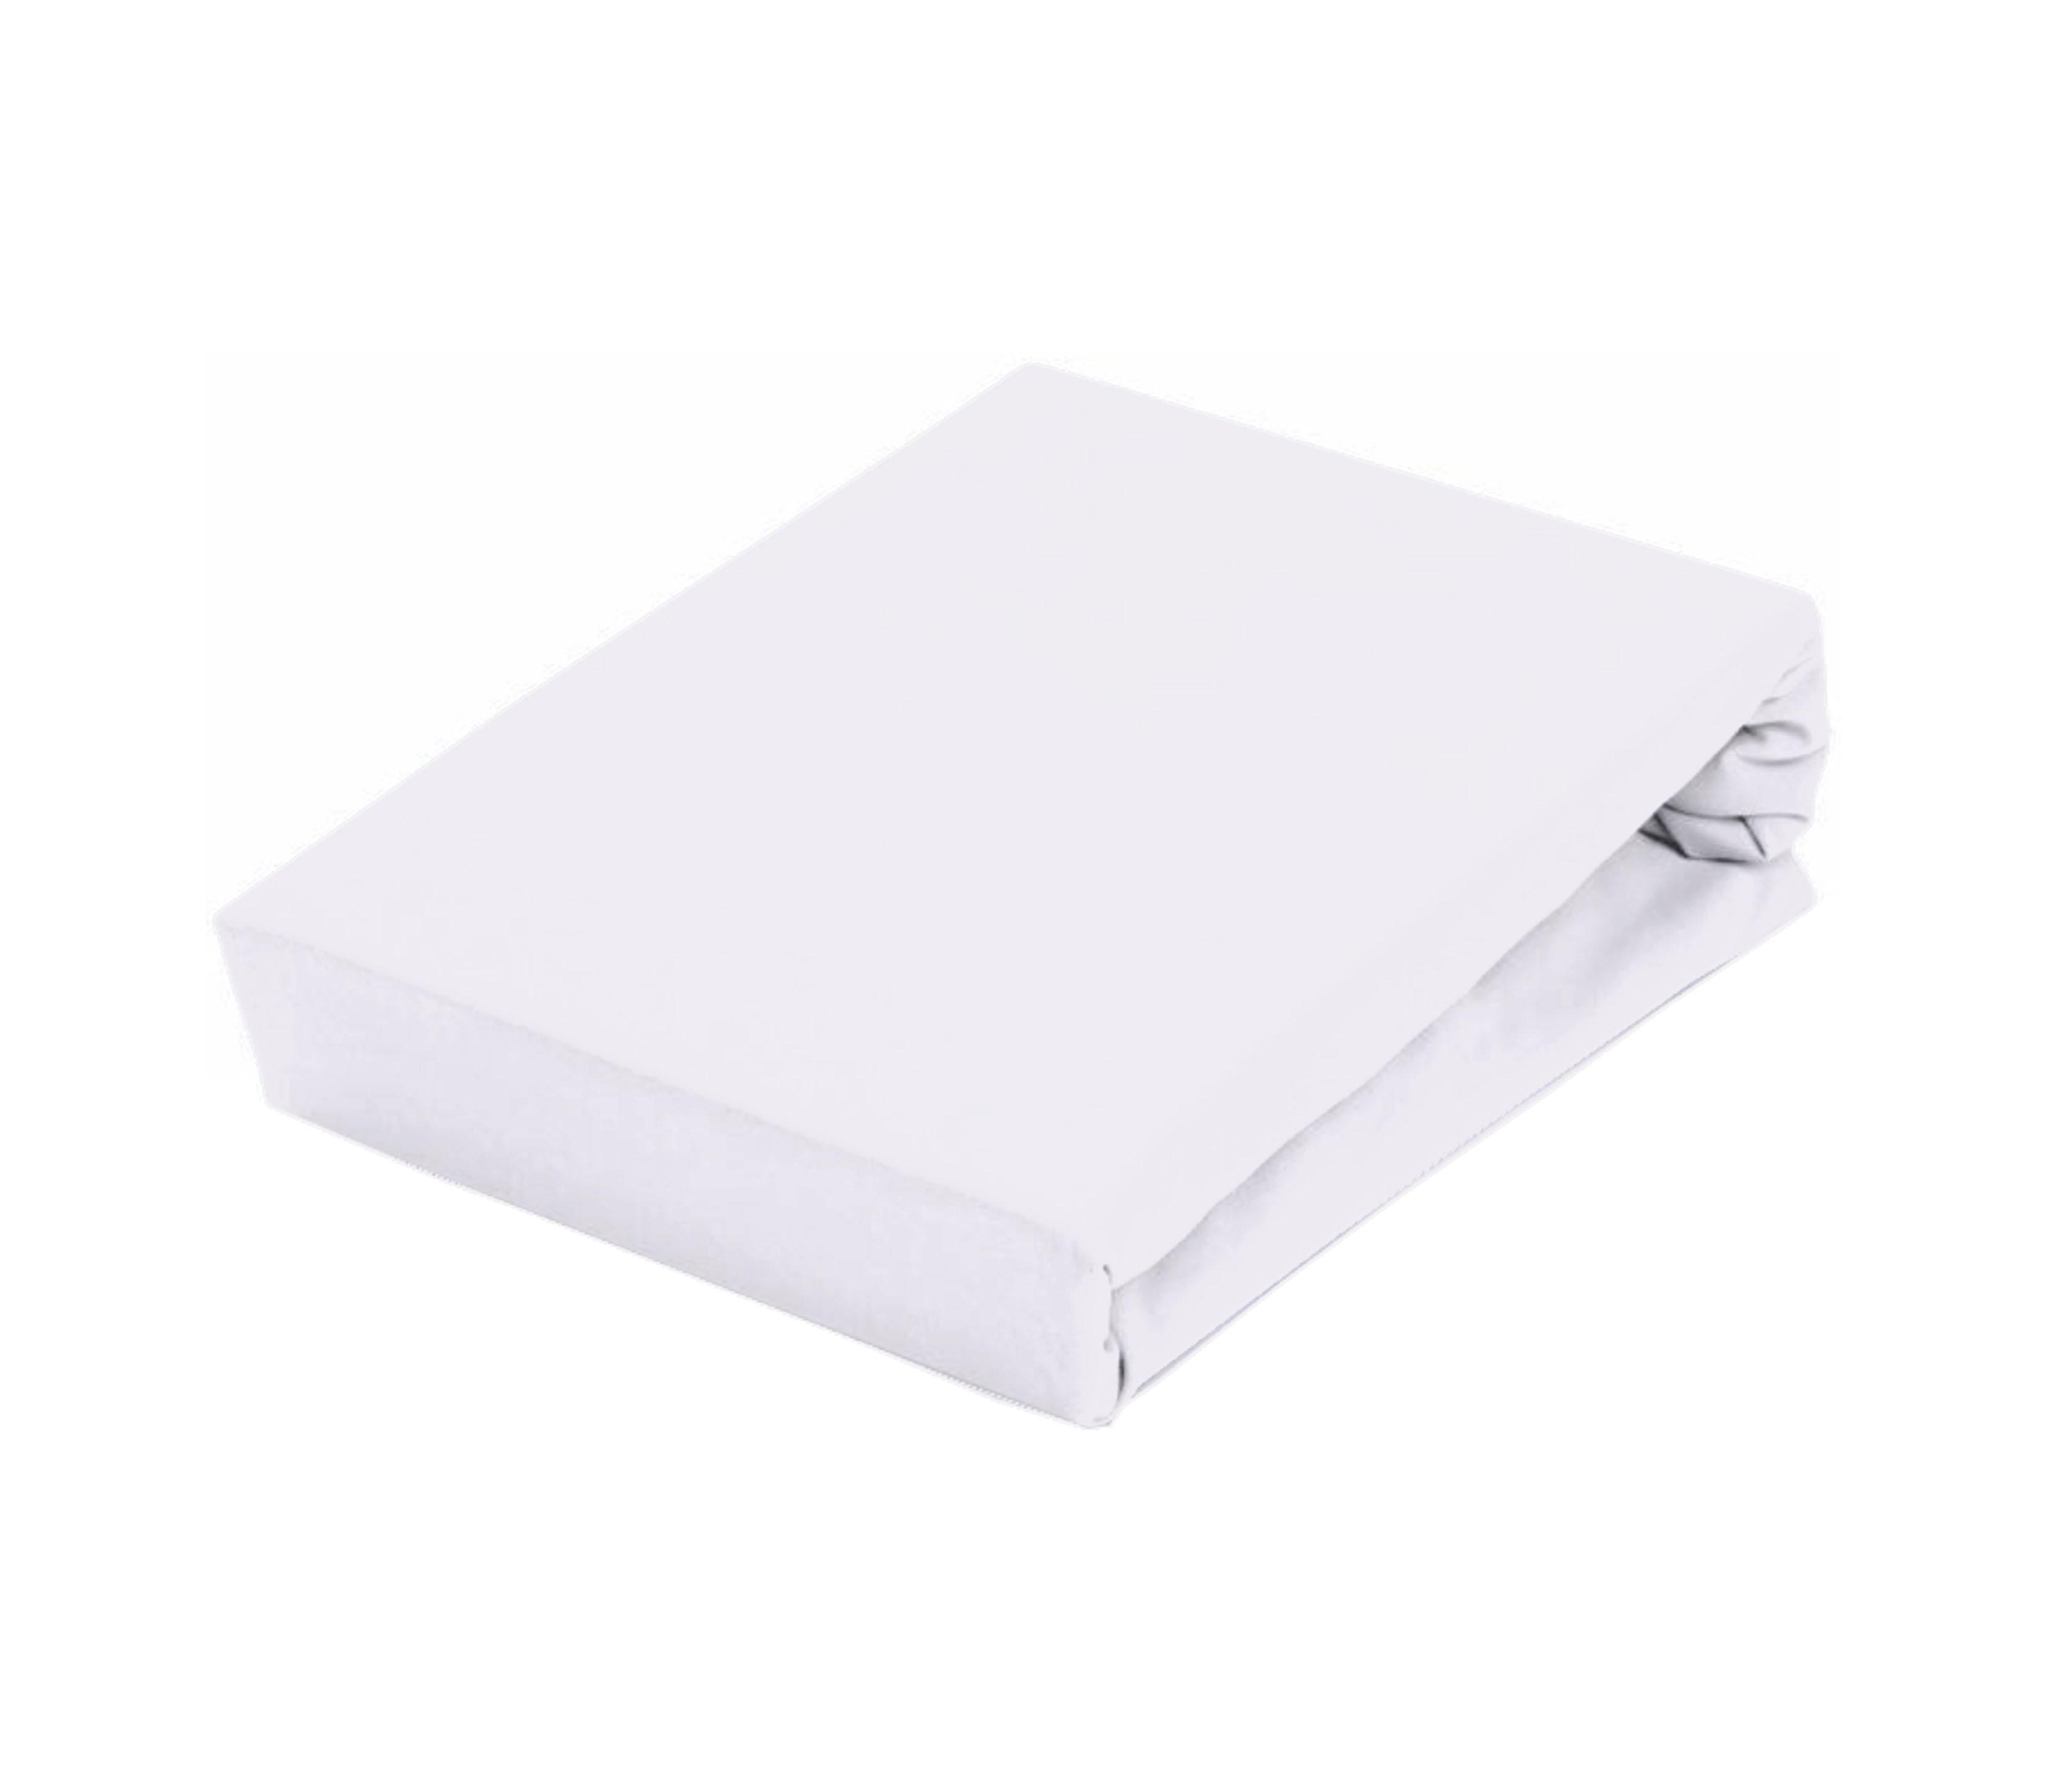 Aga Prostěradlo JERSEY 90x200 cm  Barva prostěradla: Bílá